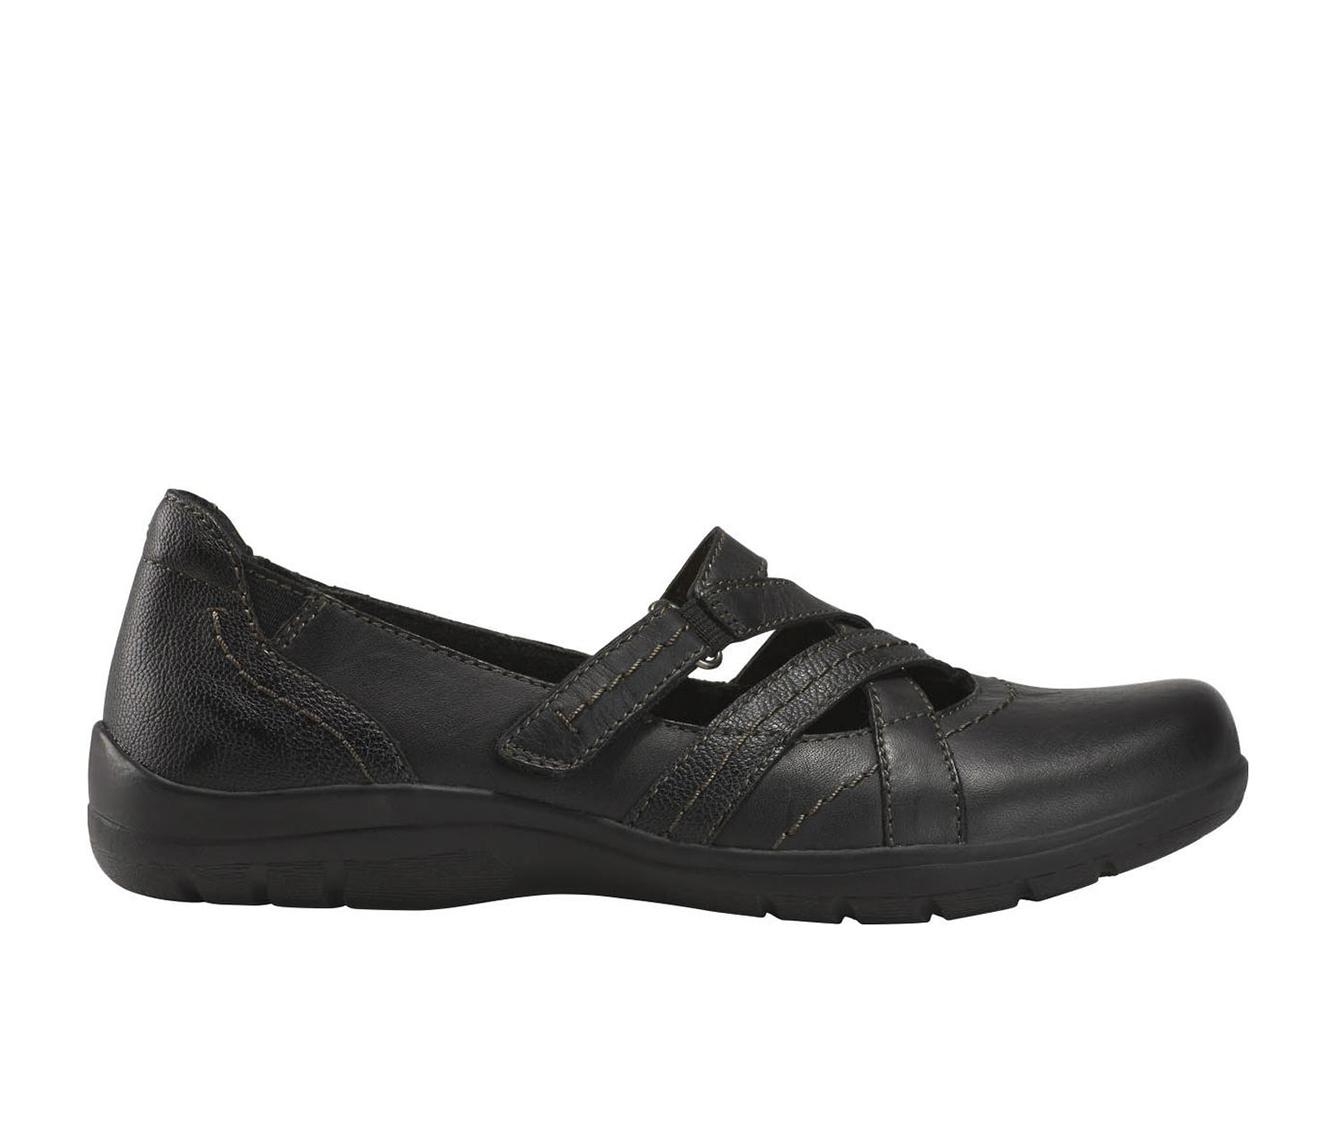 Earth Origins Rapid 2 Raelynn Women's Shoe (Black Leather)